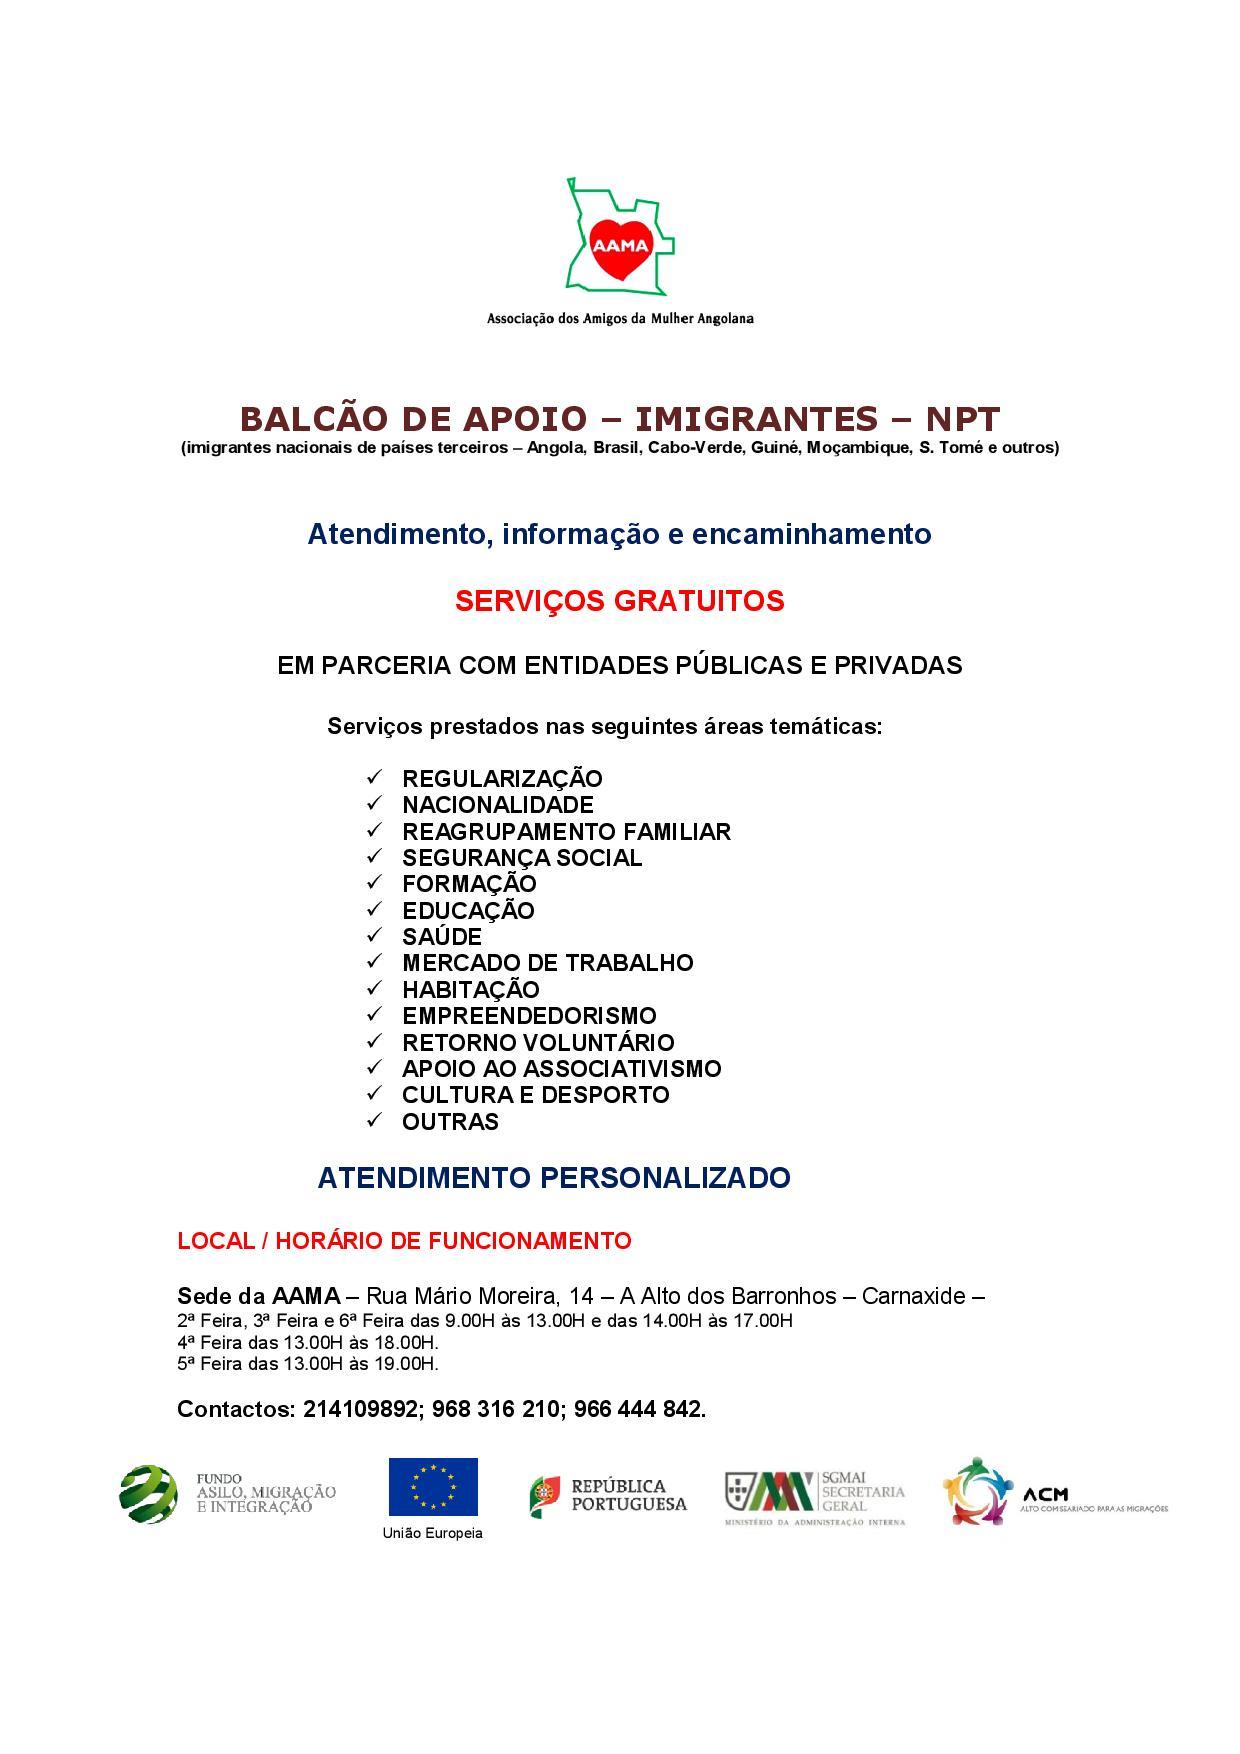 You are currently viewing Balcão de Apoio – Imigrantes NPT